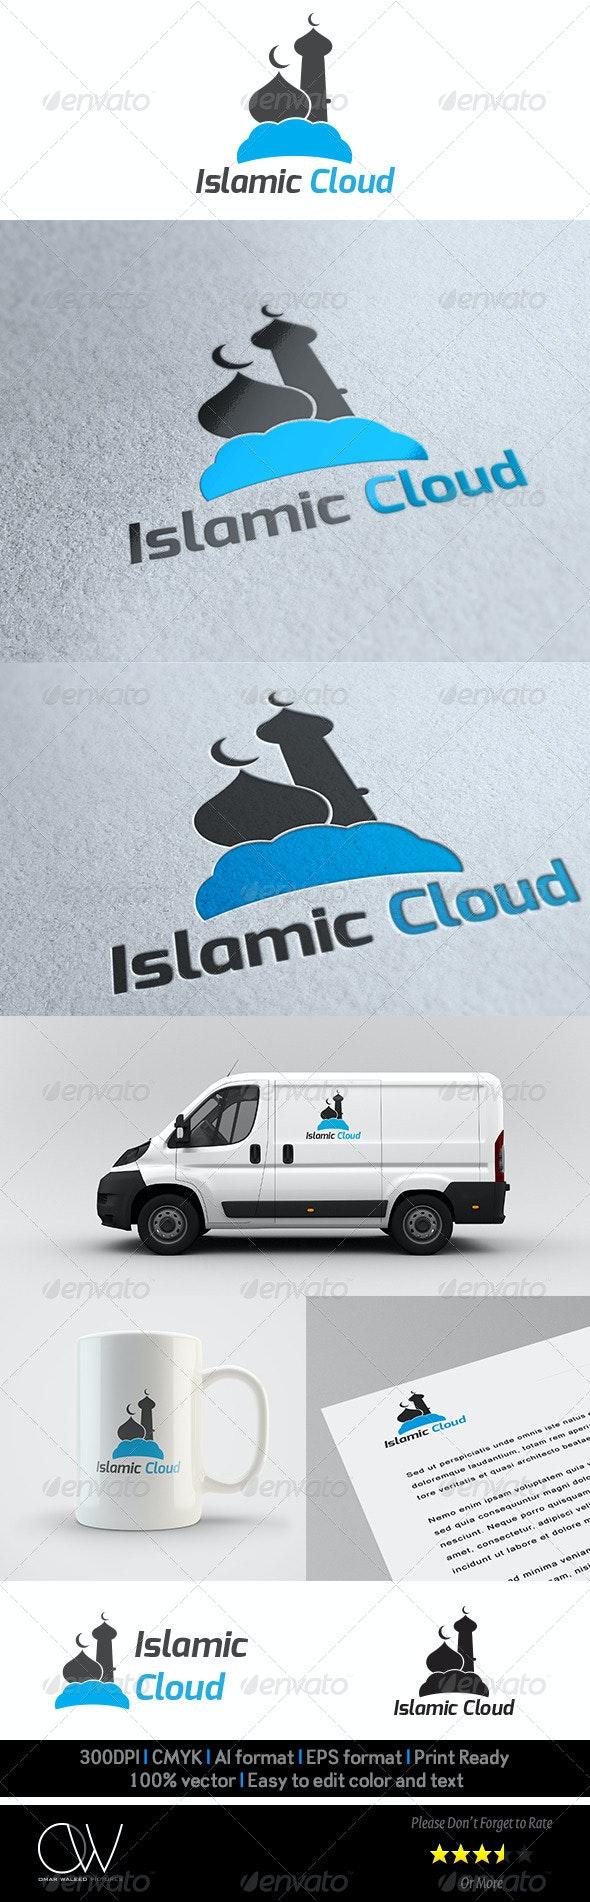 Islamic Cloud Logo Template - Vector Abstract